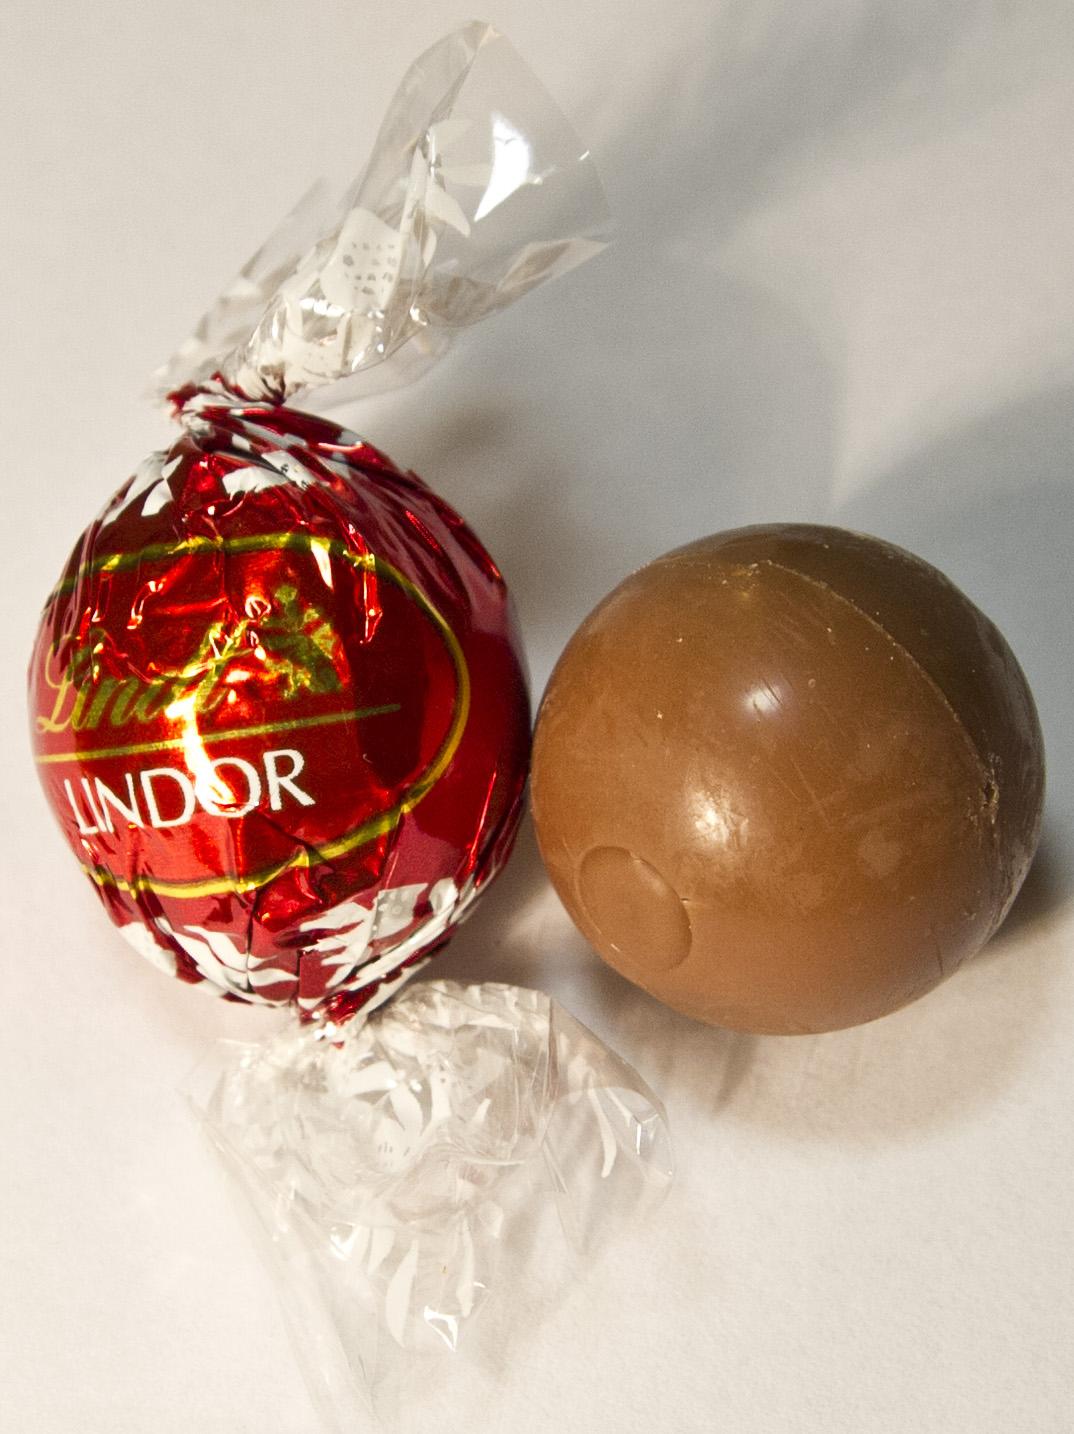 File:Lindt Lindor chocolate.jpg - Wikimedia Commons